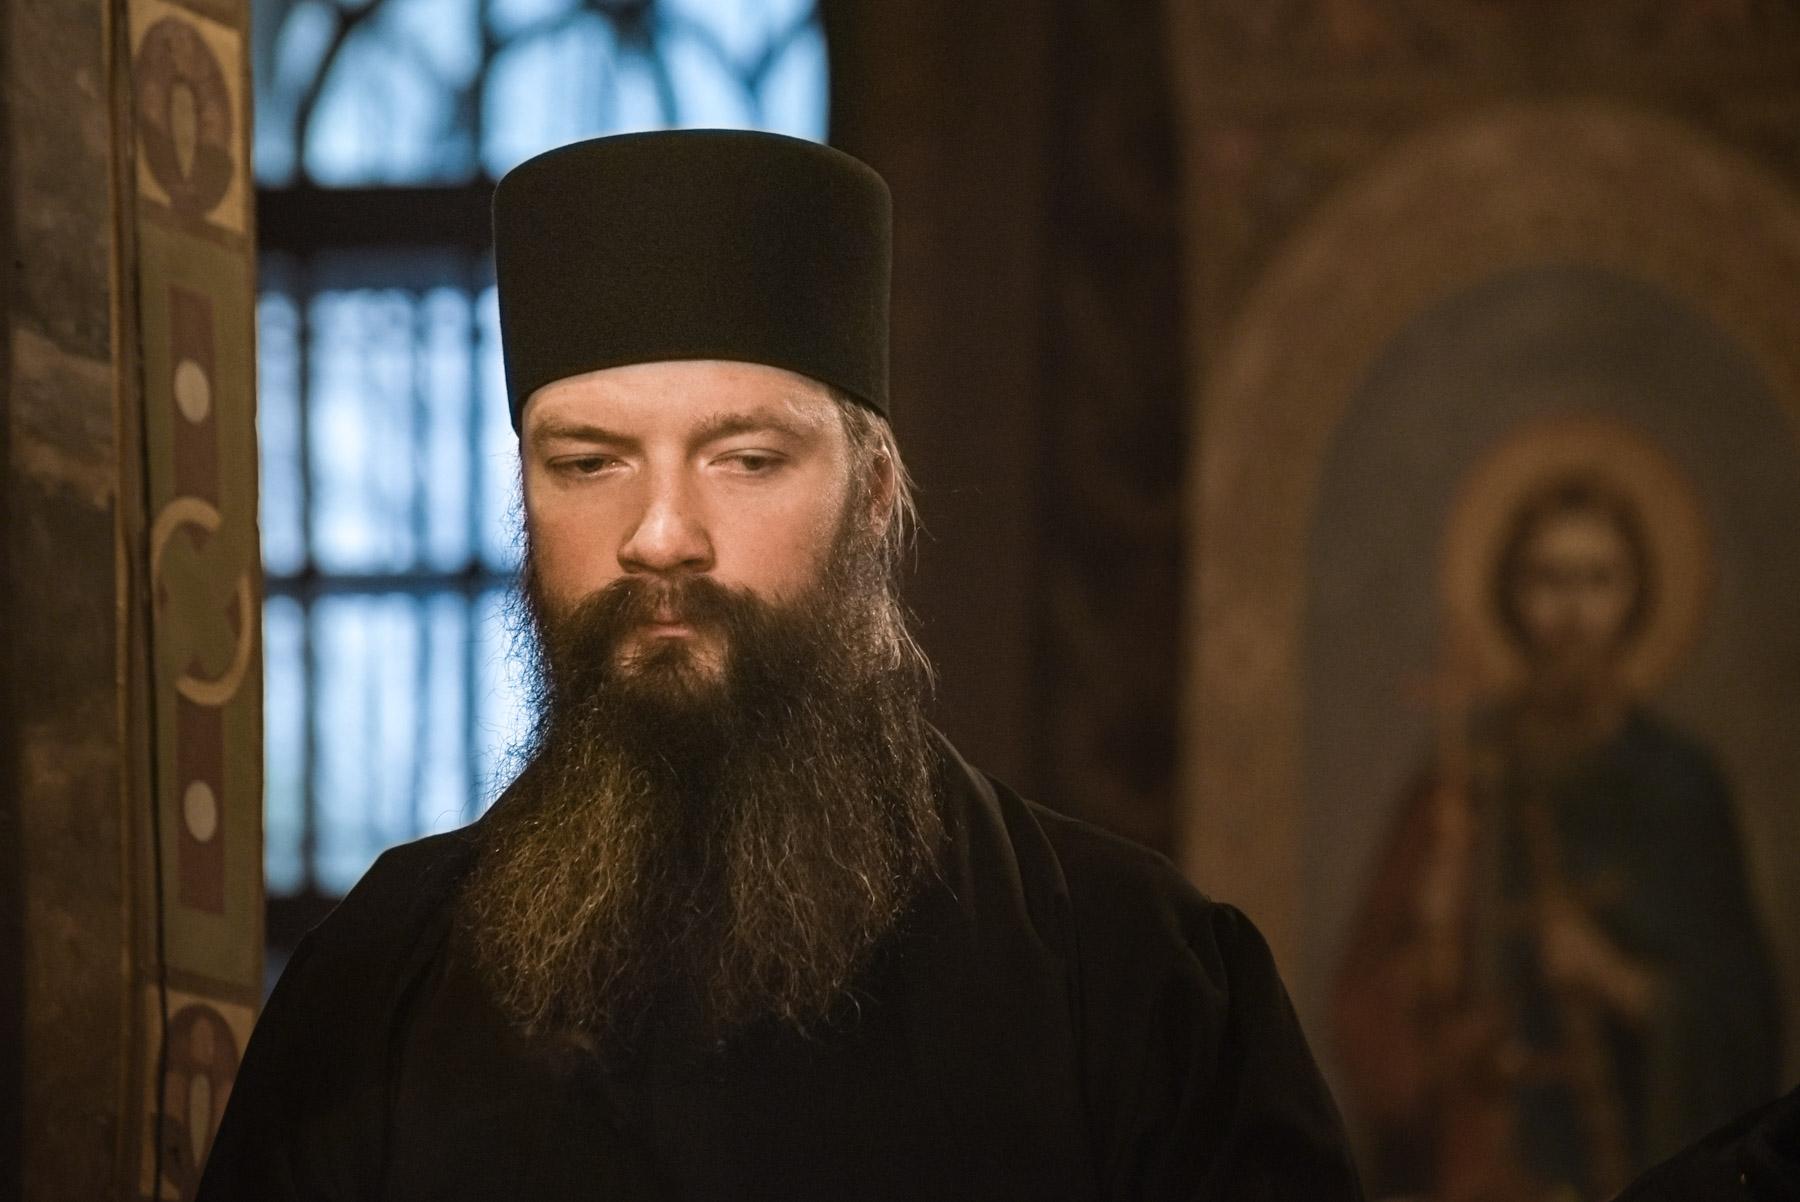 photos of orthodox christmas 0108 2